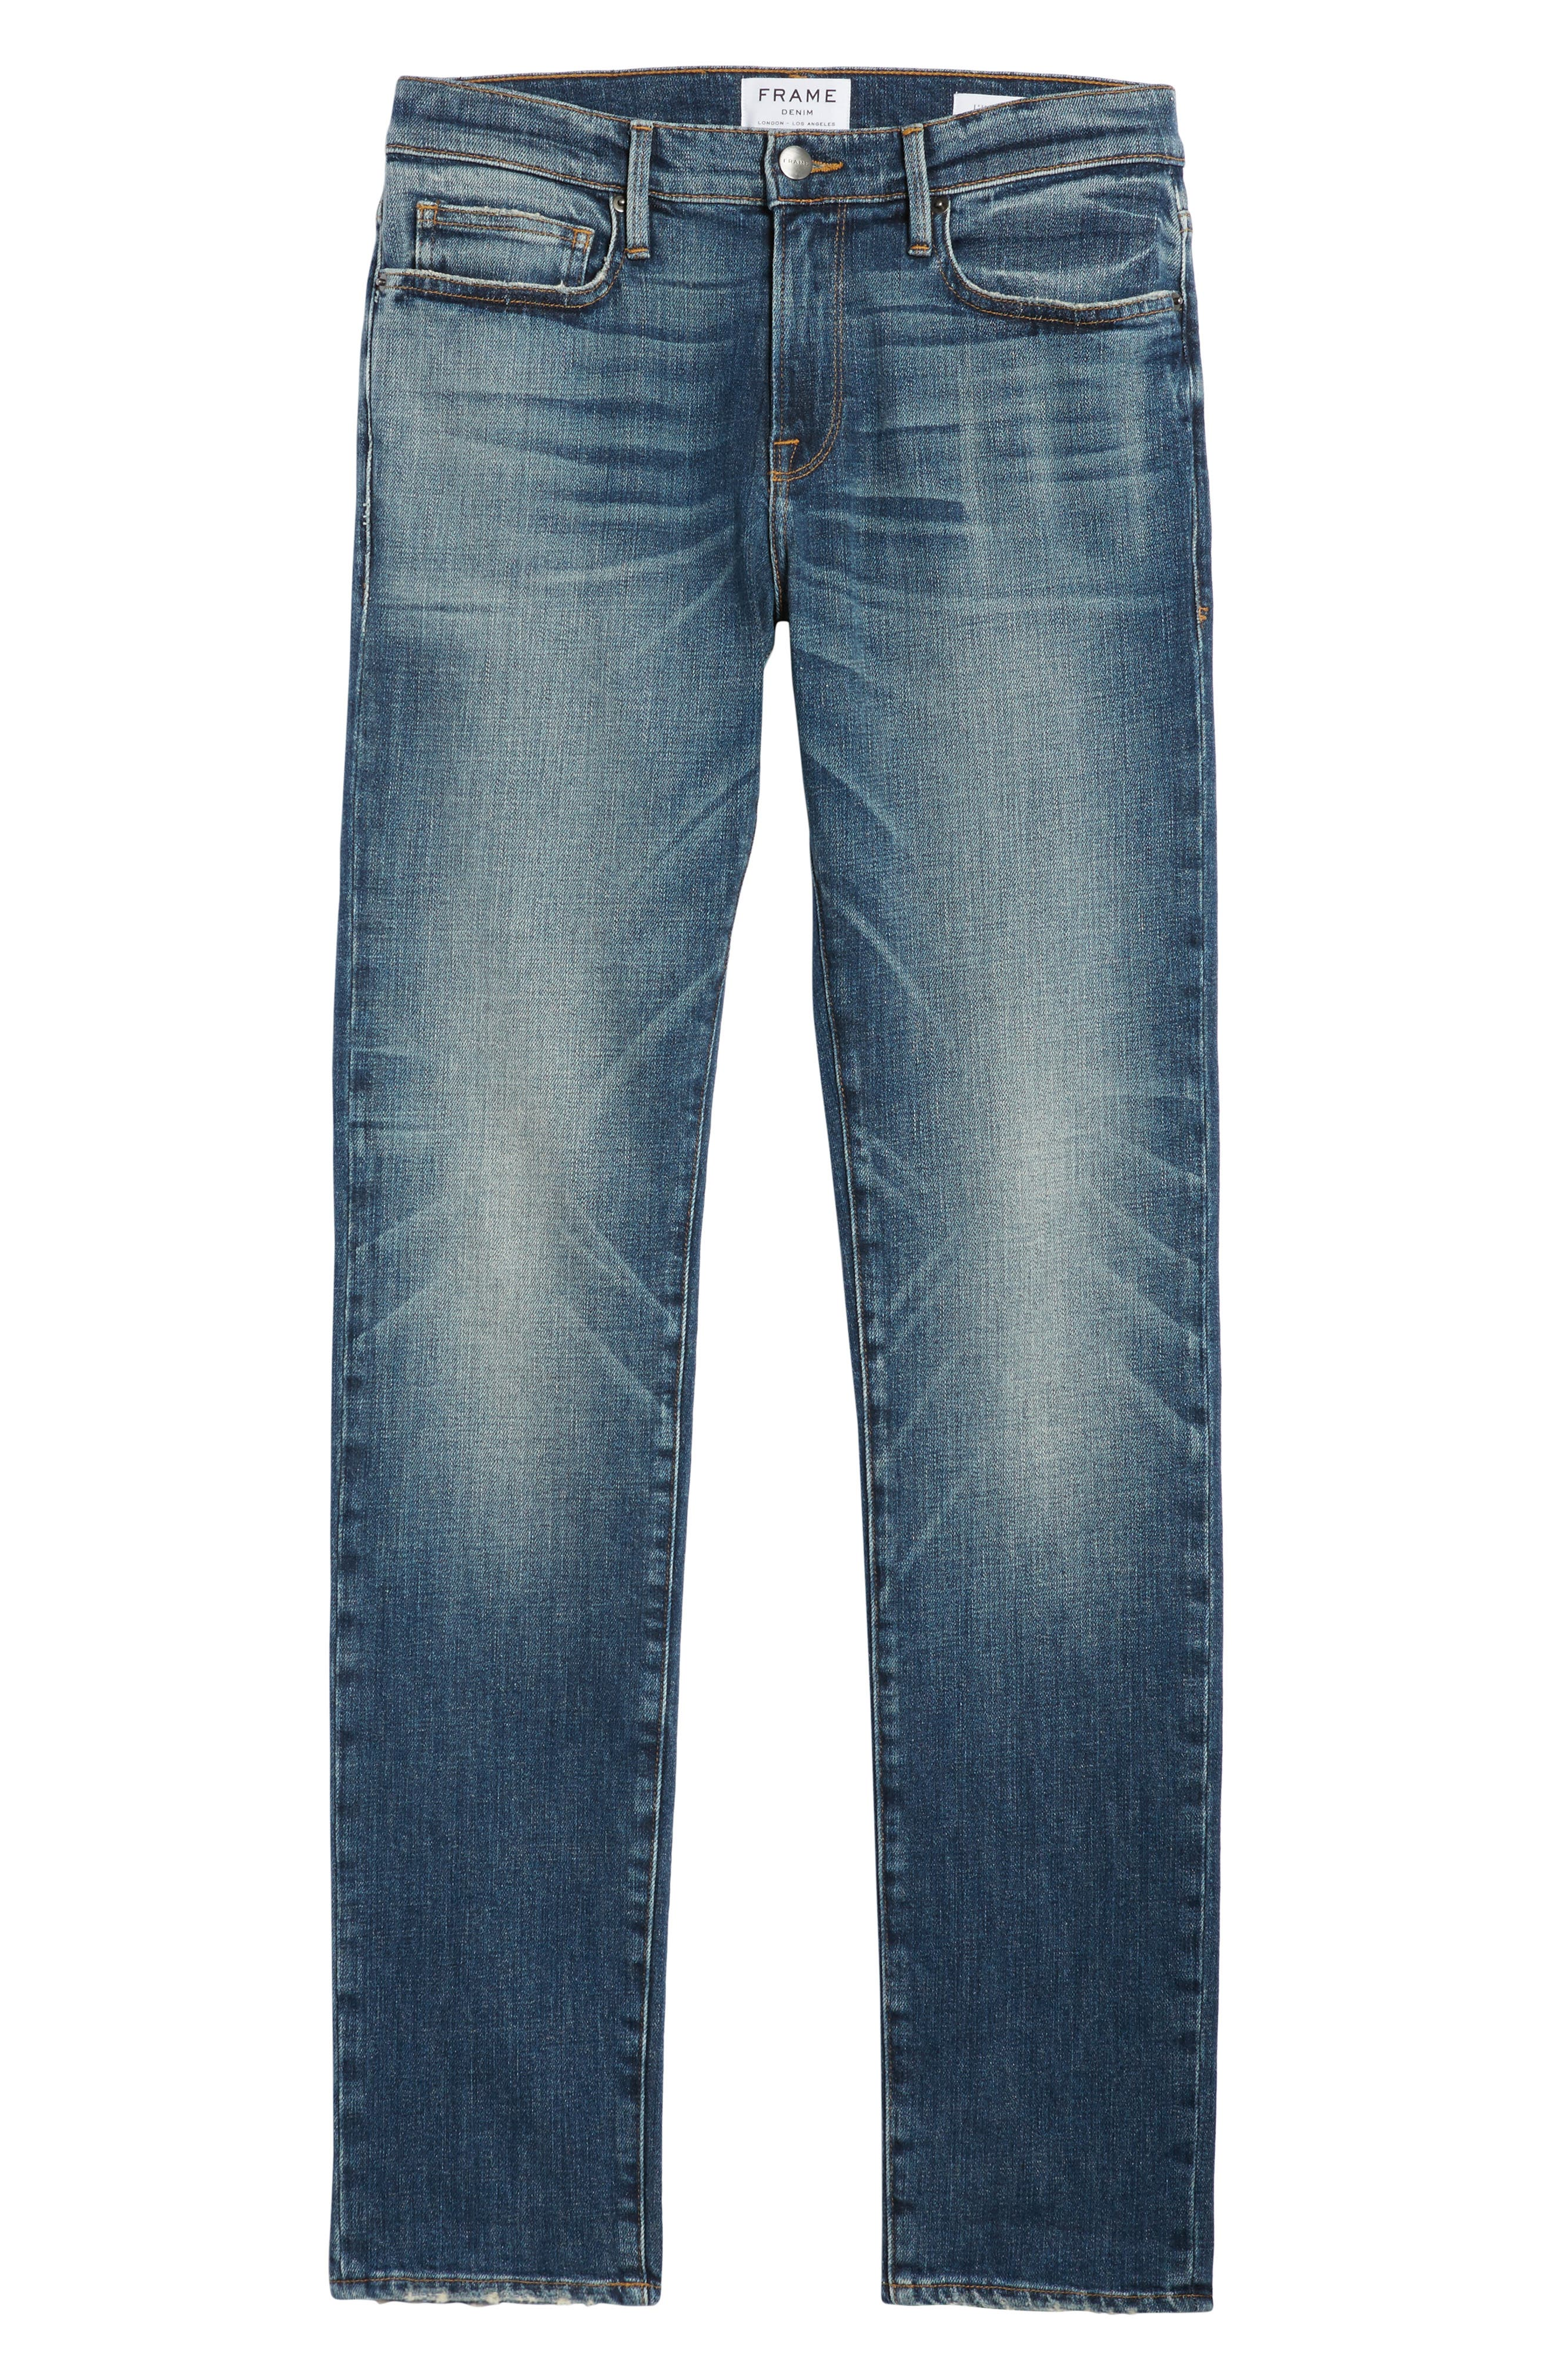 L'Homme Skinny Fit Jeans,                             Alternate thumbnail 6, color,                             405